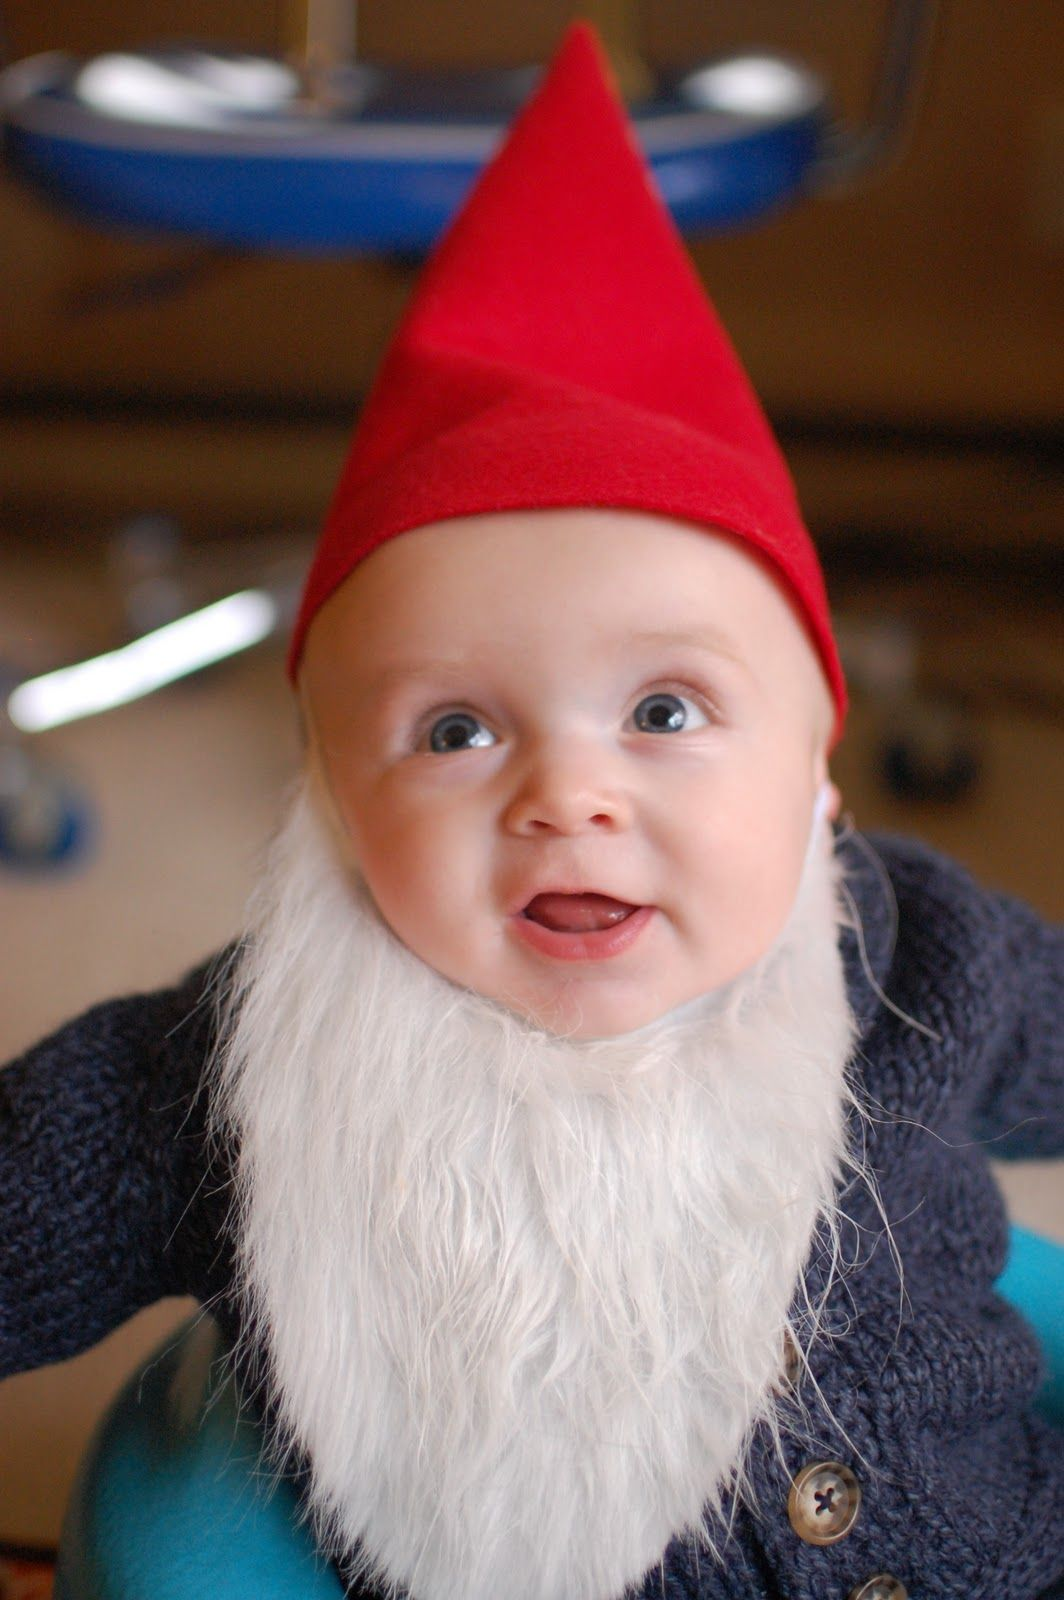 diy halloween gnome costume for your baby diy pinterest kleider kinder fasnacht und kost m. Black Bedroom Furniture Sets. Home Design Ideas